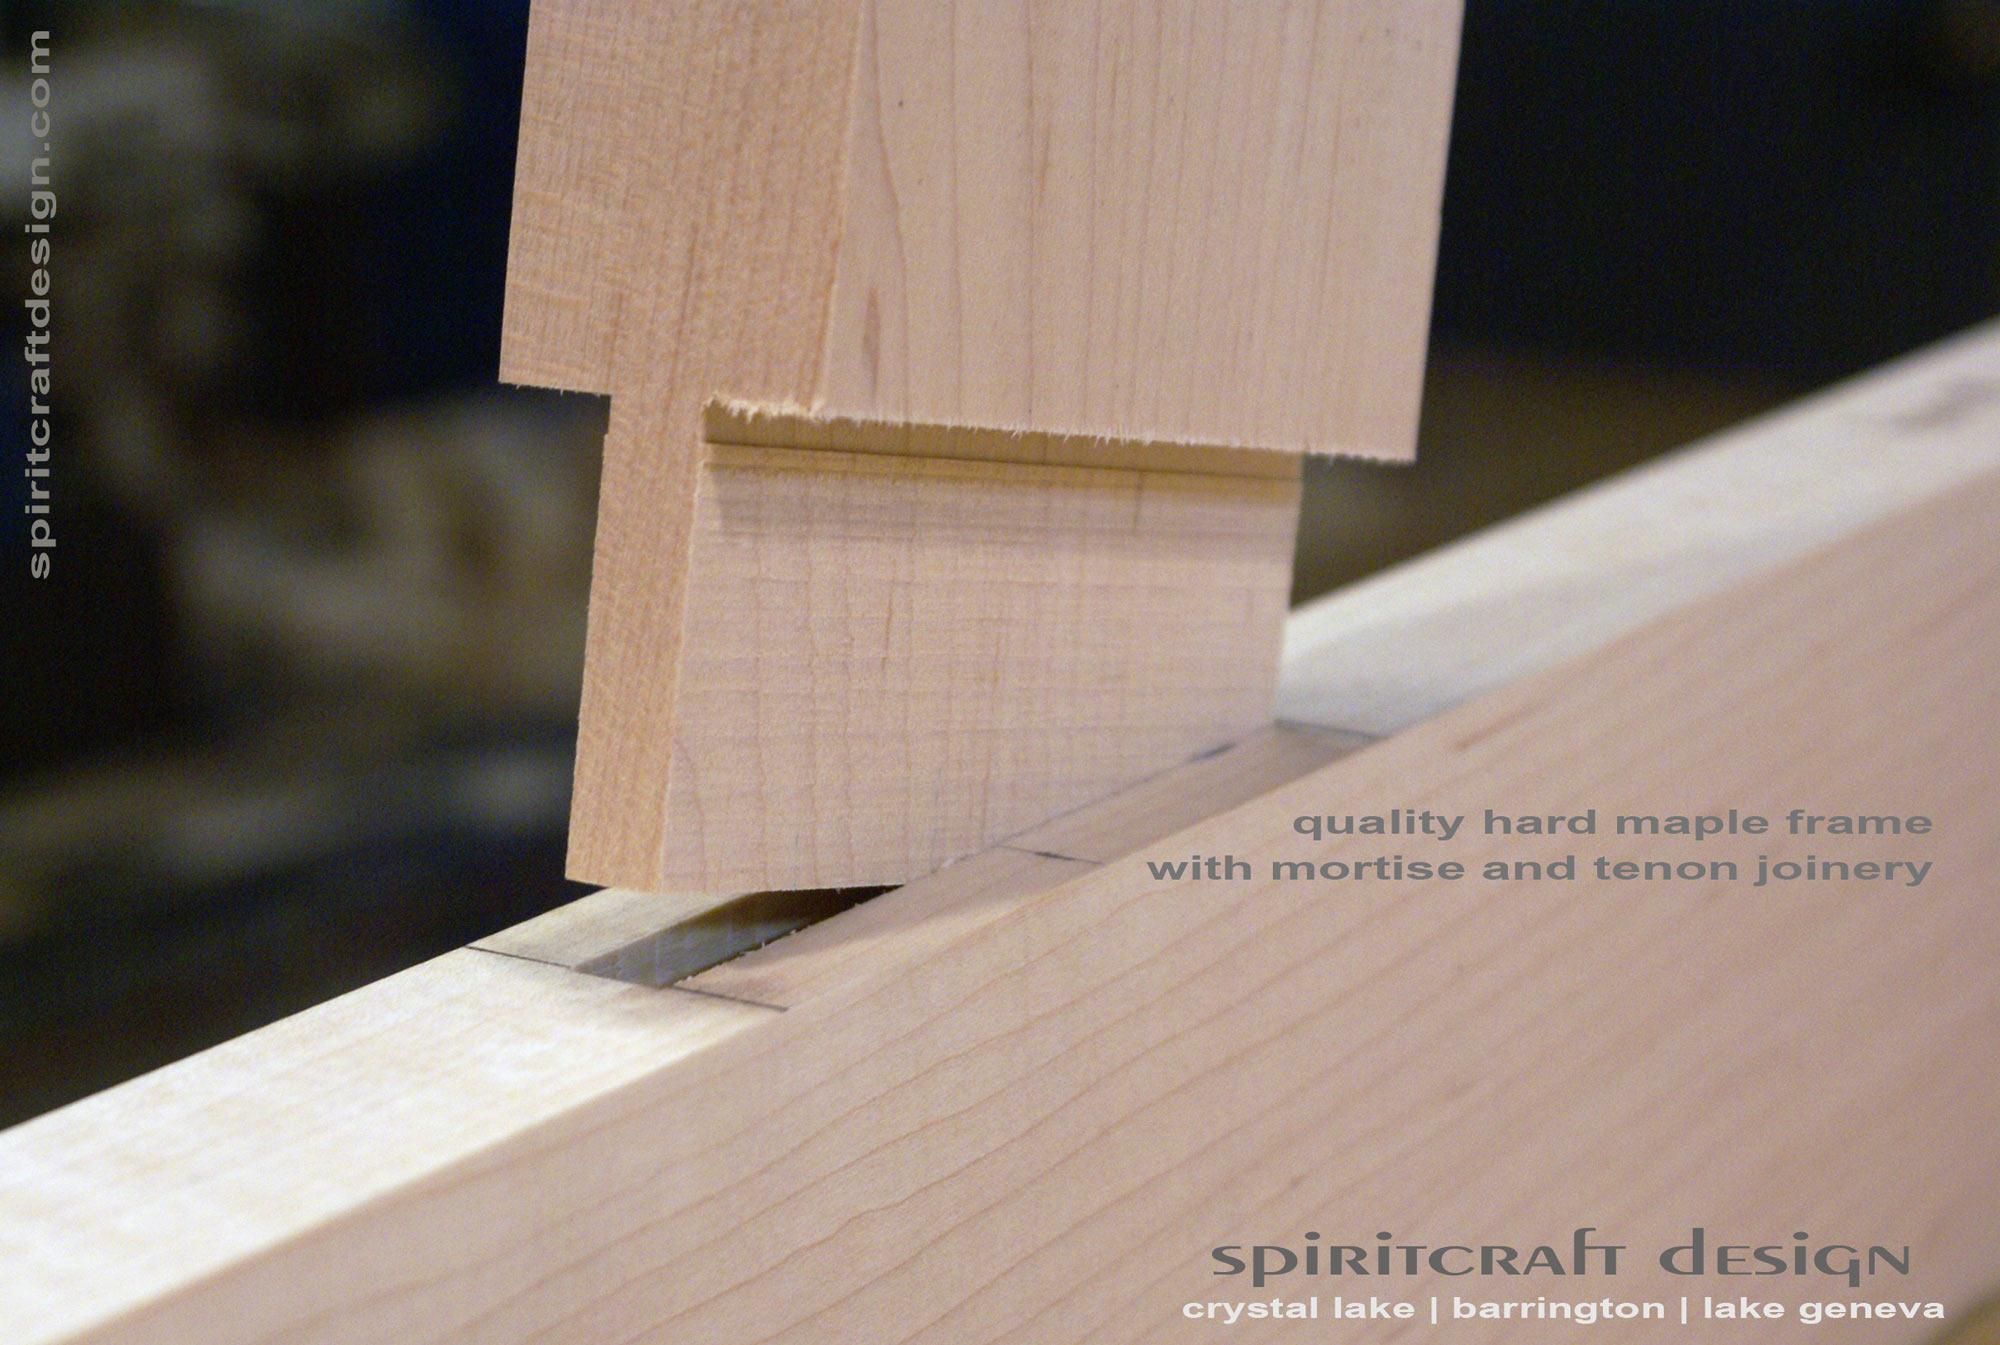 Design Craft Upholstery